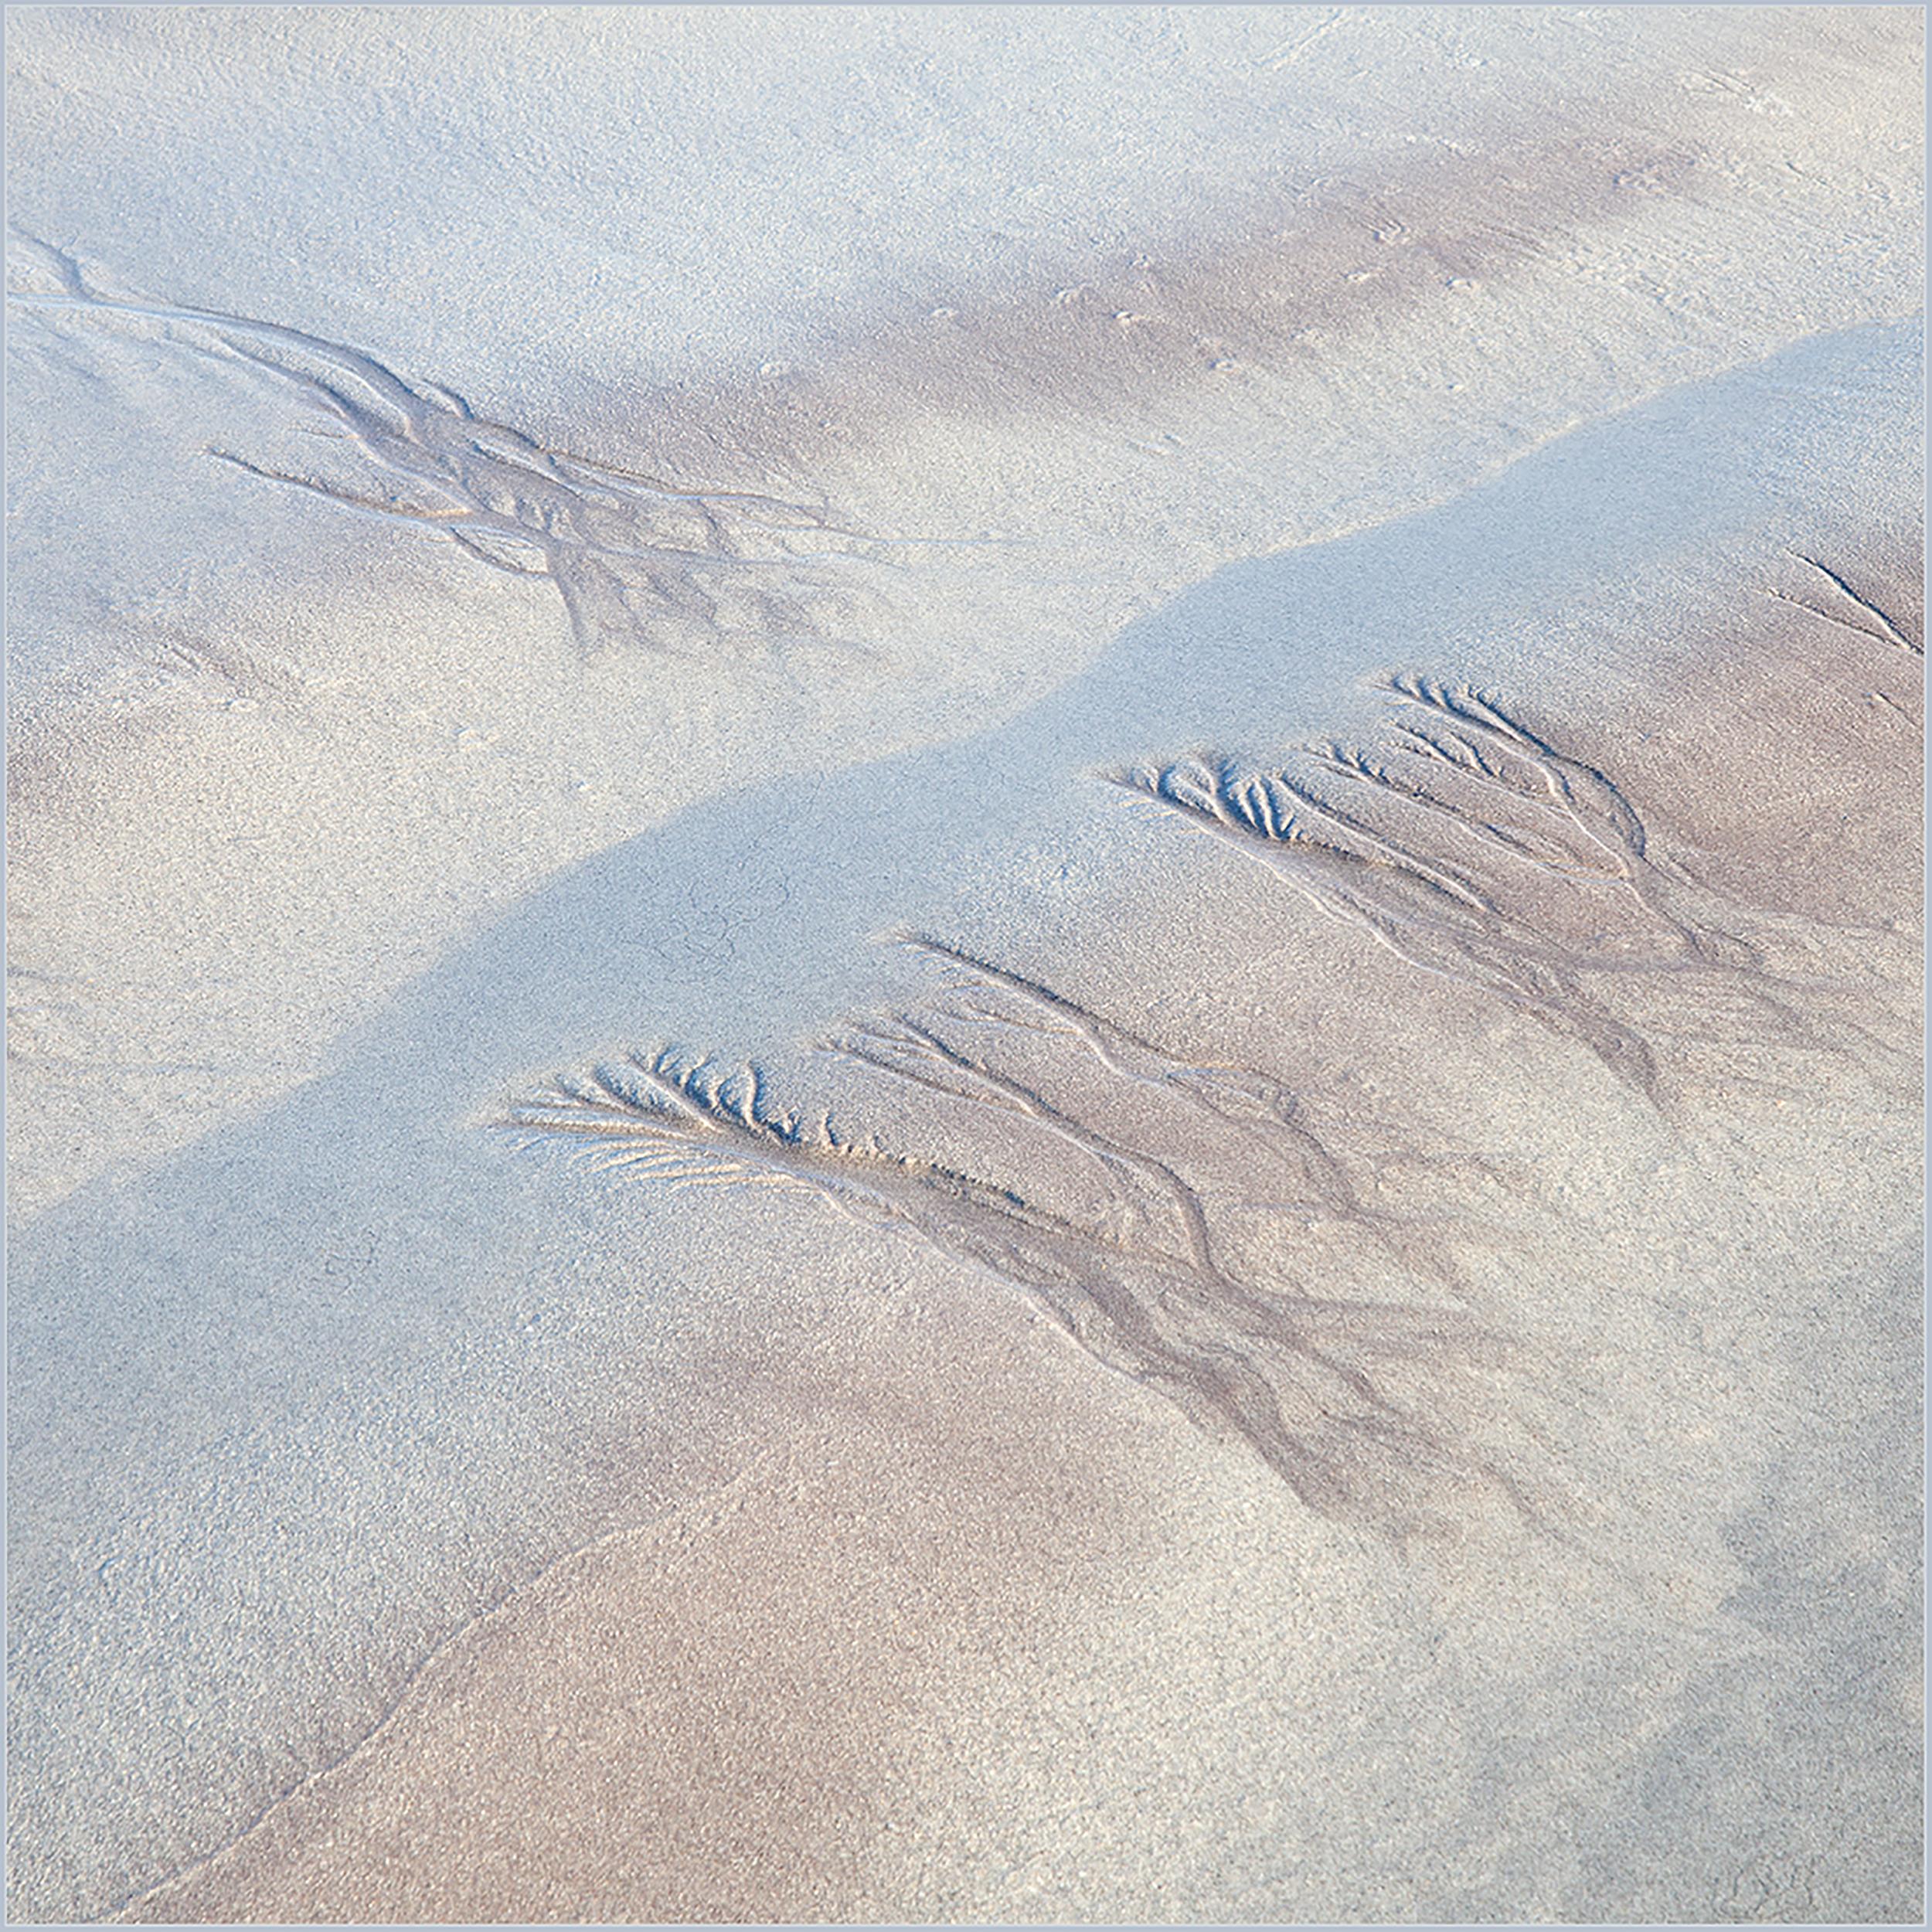 Sand & Water 4.jpg